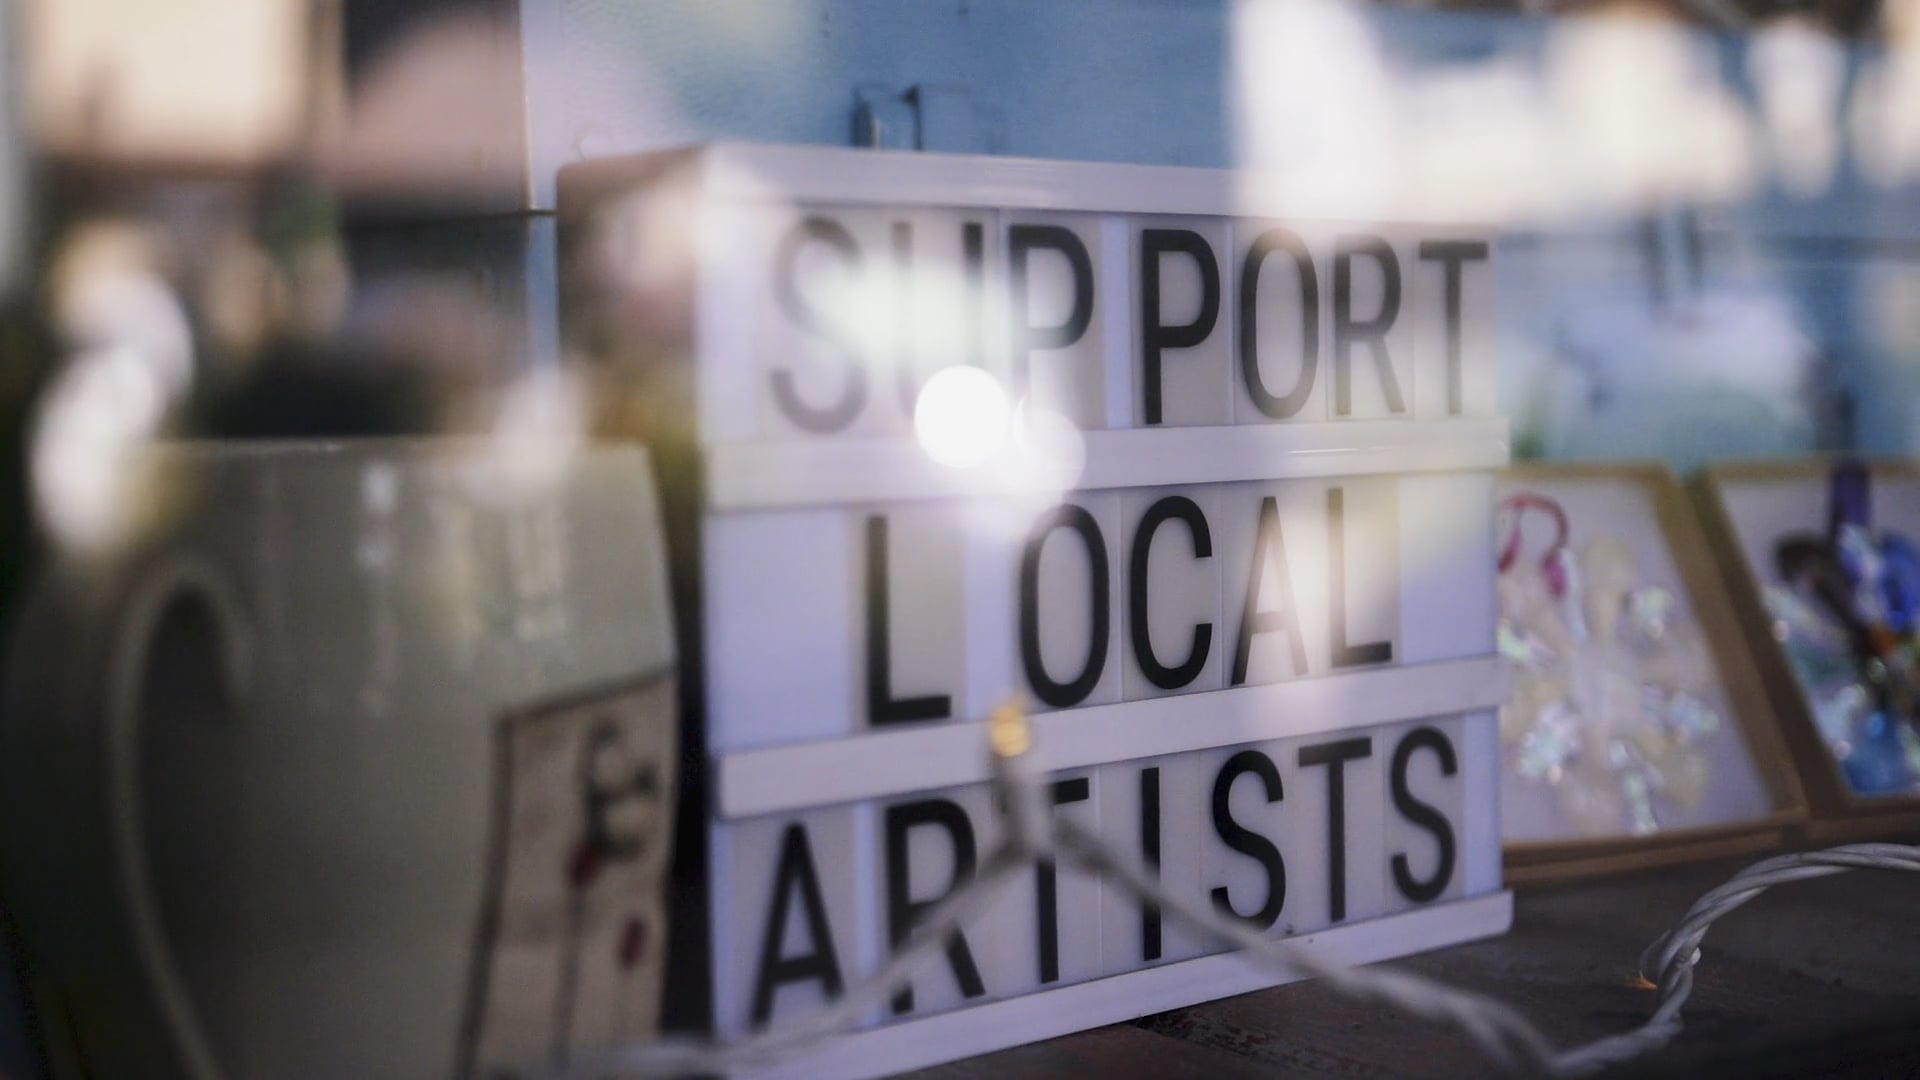 Local Artisans in North Lake Tahoe